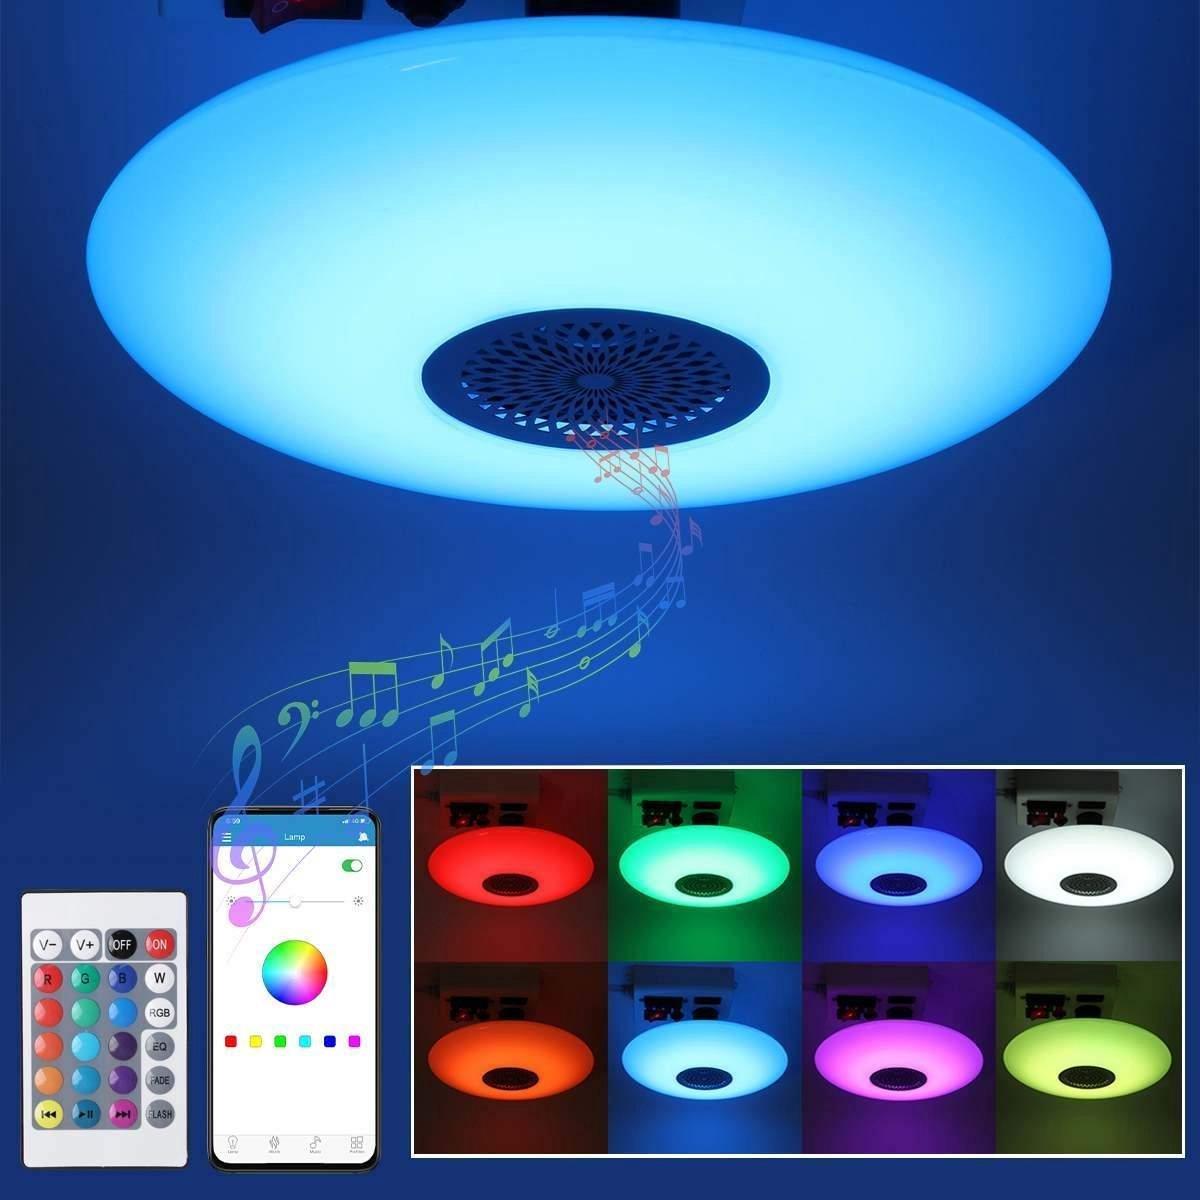 Slimme RGBW wifi LED lamp van Smart life   E27   Speaker  18W Met APP en Afstandsbediening!   Smart E27   Smart